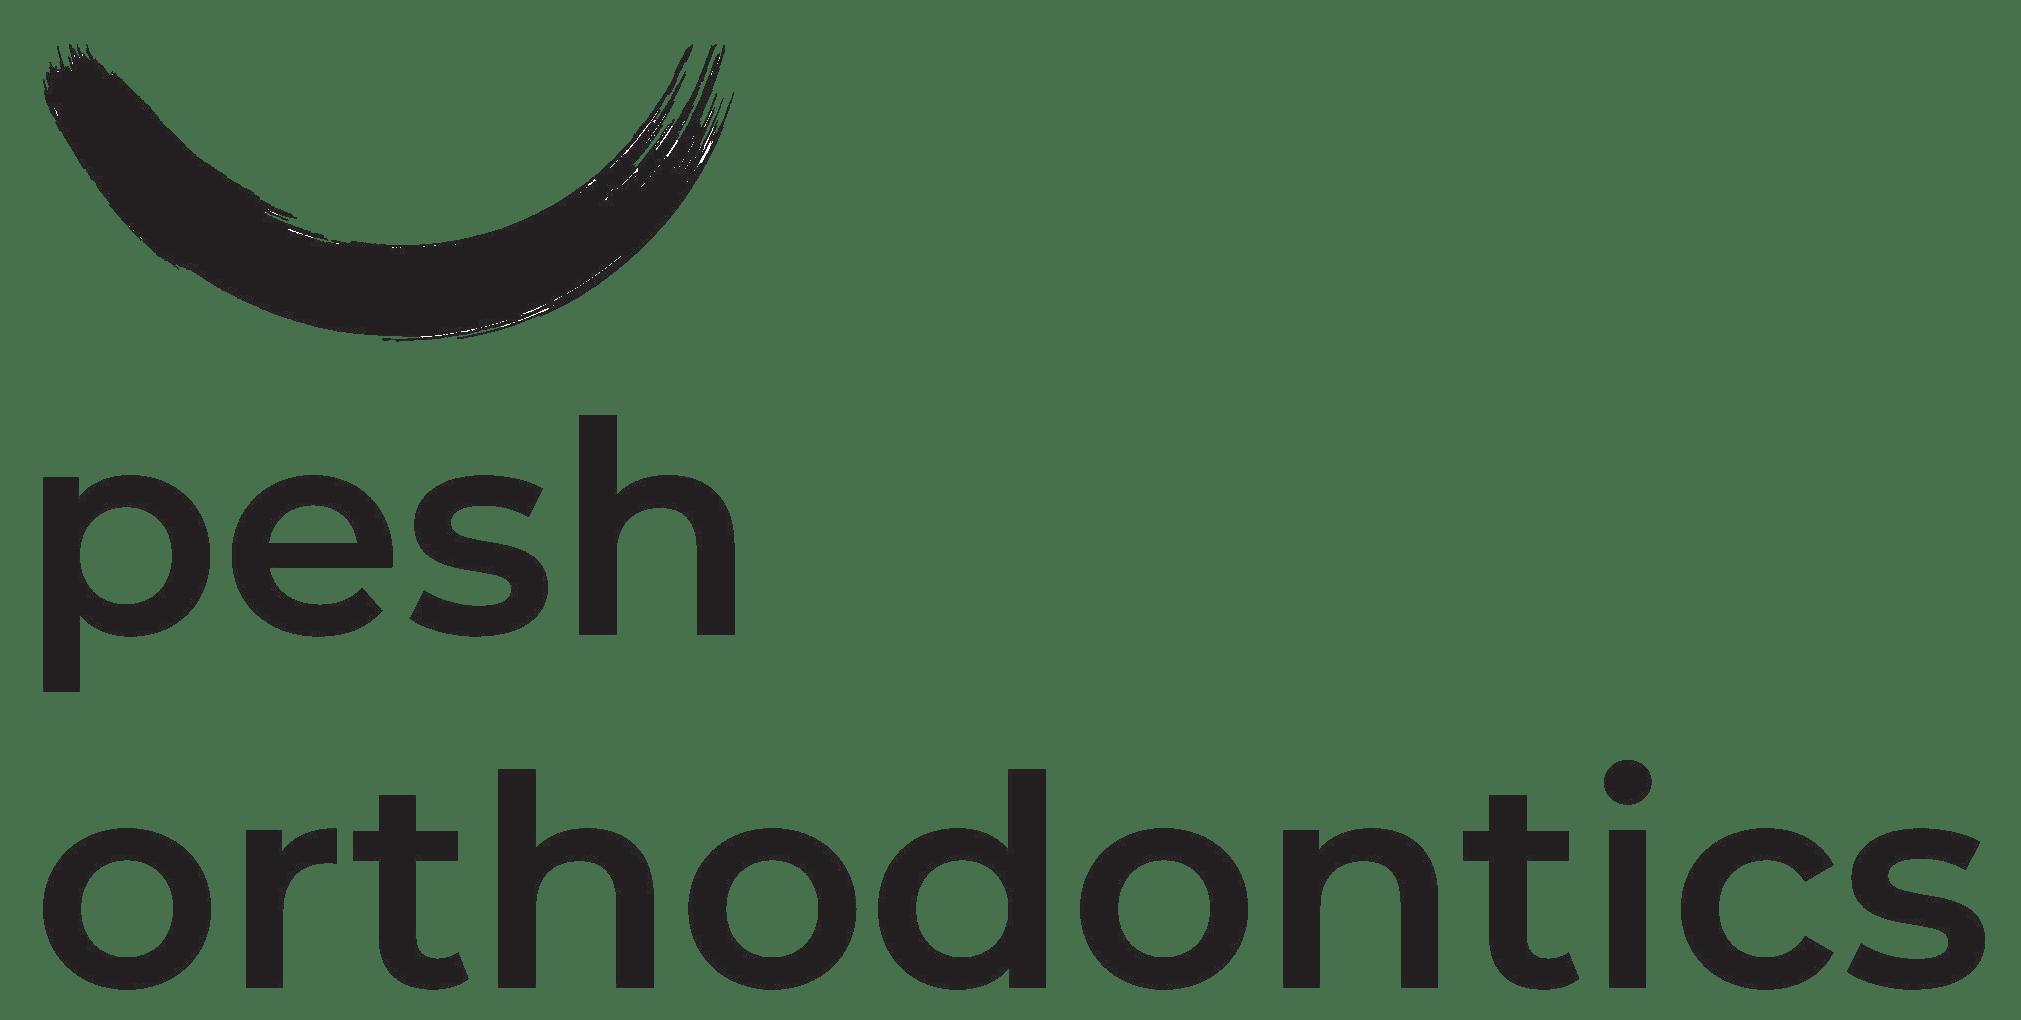 Pesh Orthodontics